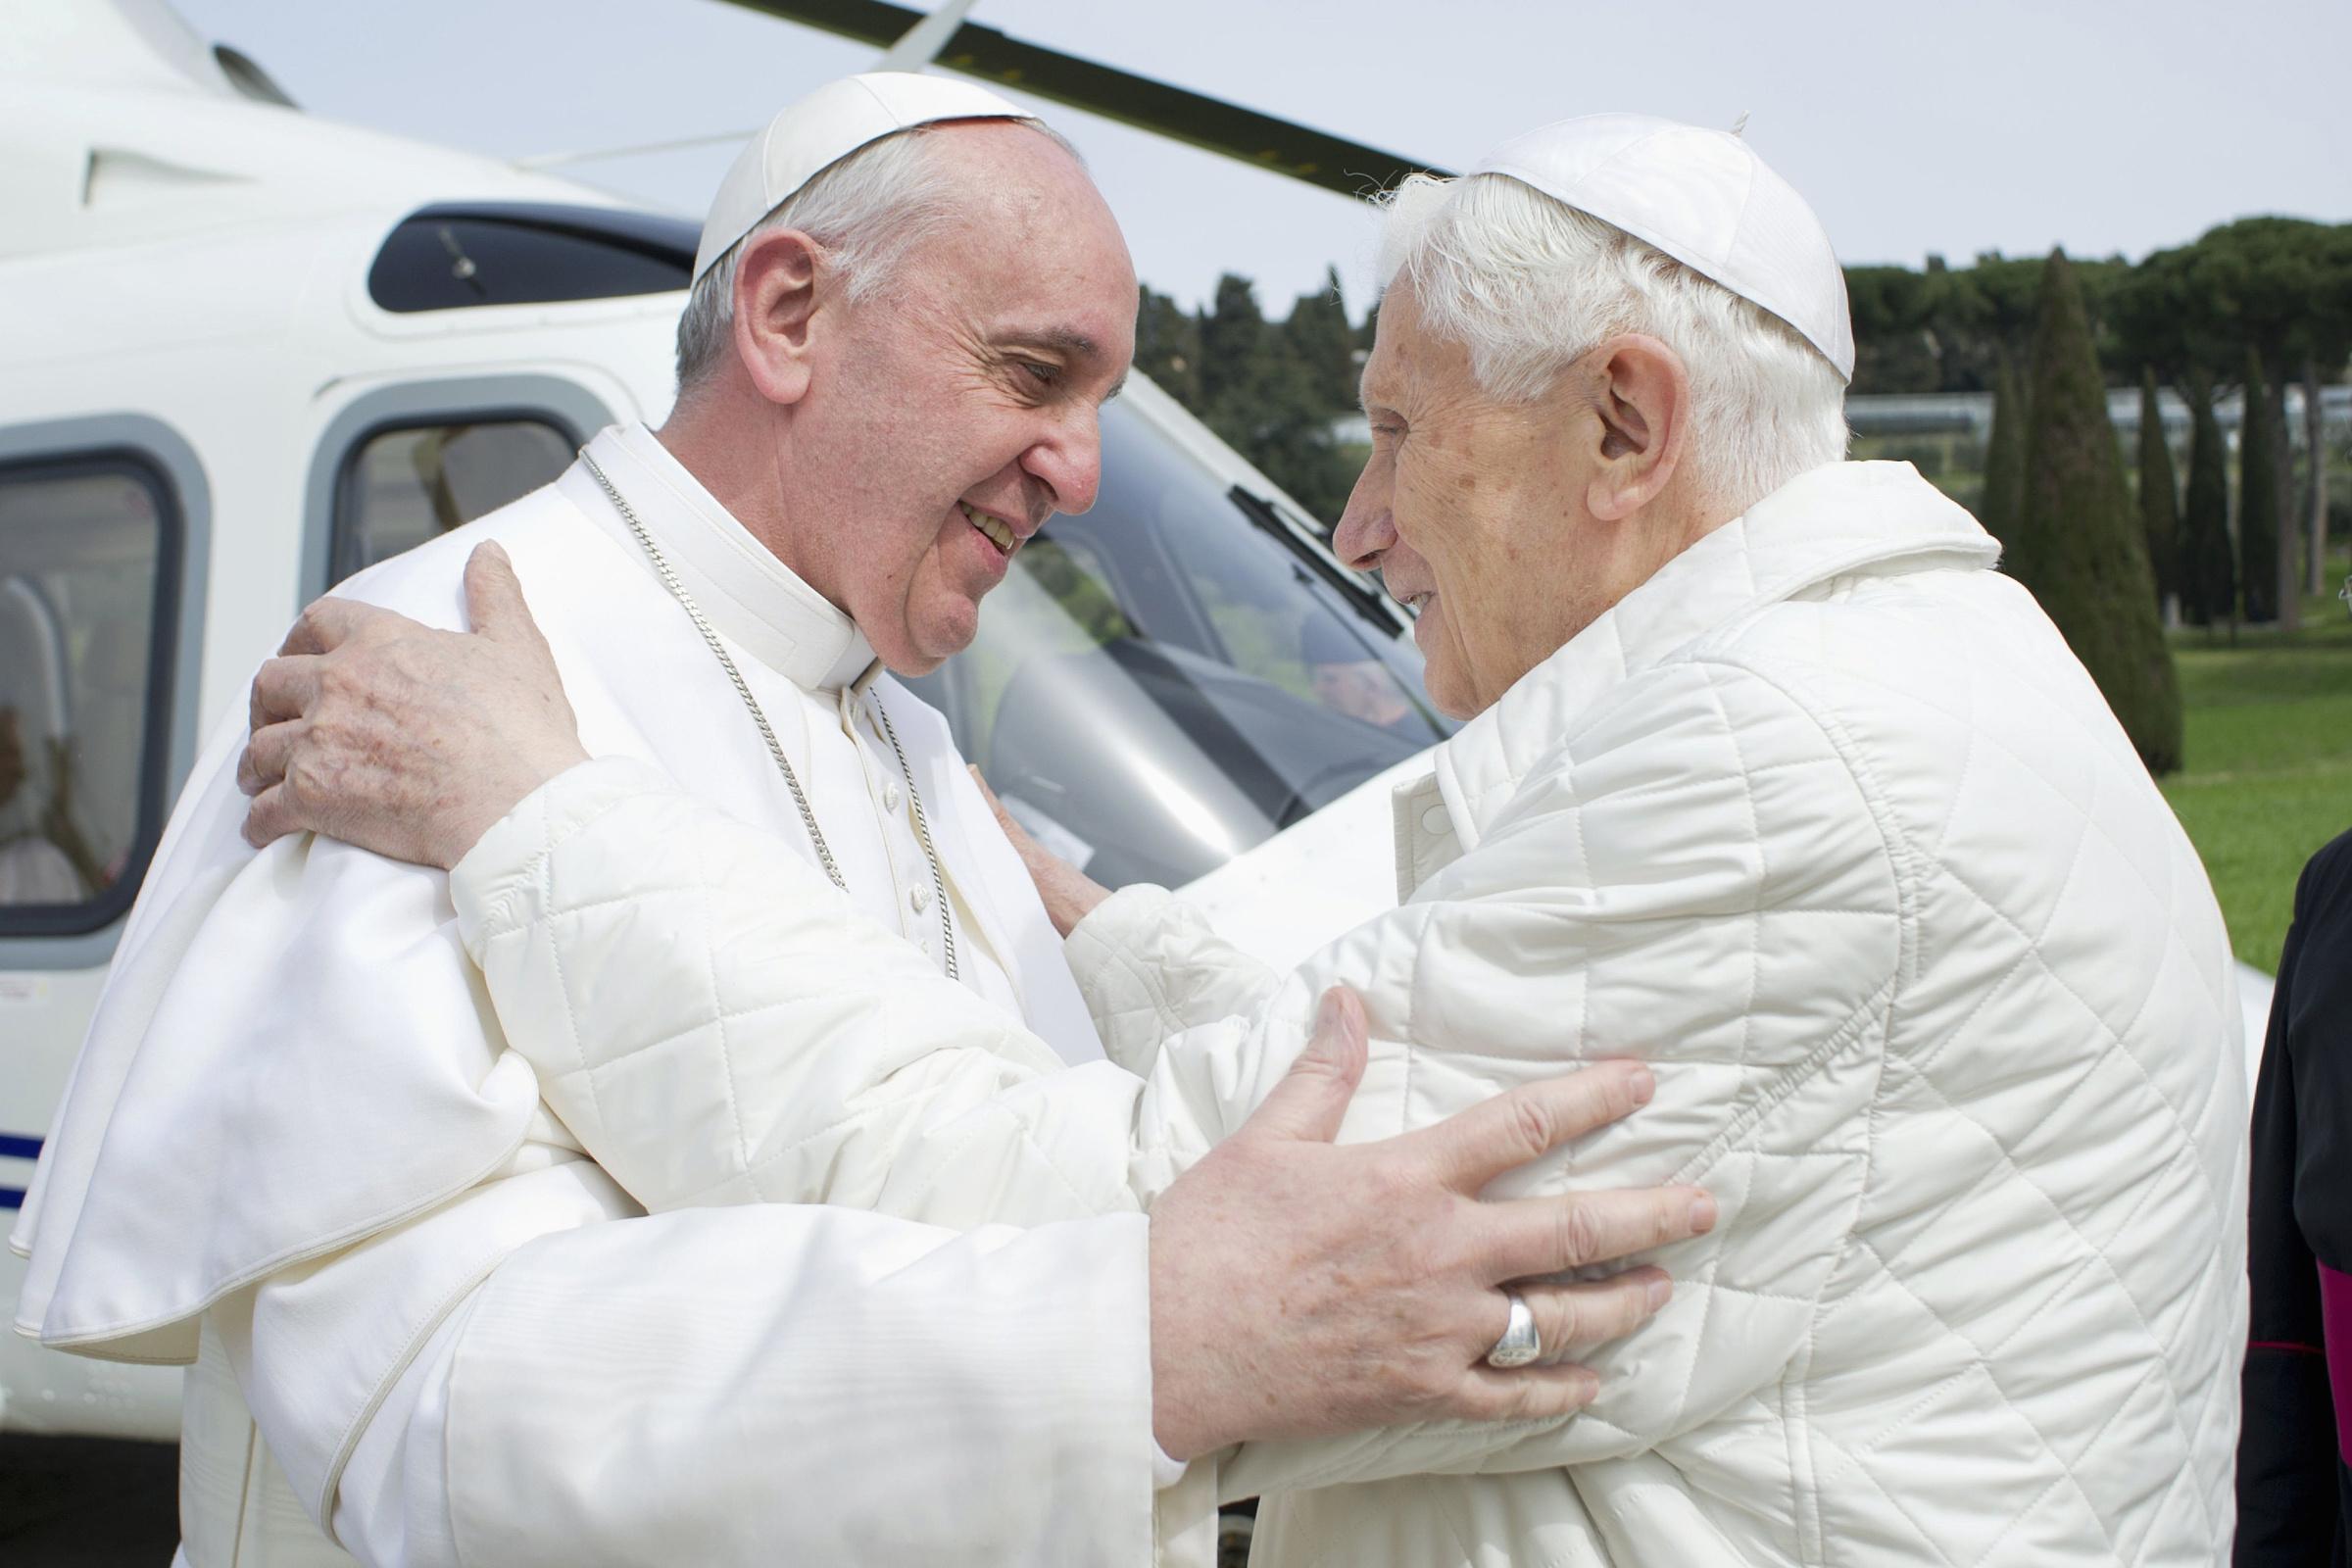 Pope Francis embraces emeritus Pope Benedict XVI at papal summer residence in Castel Gandolfo